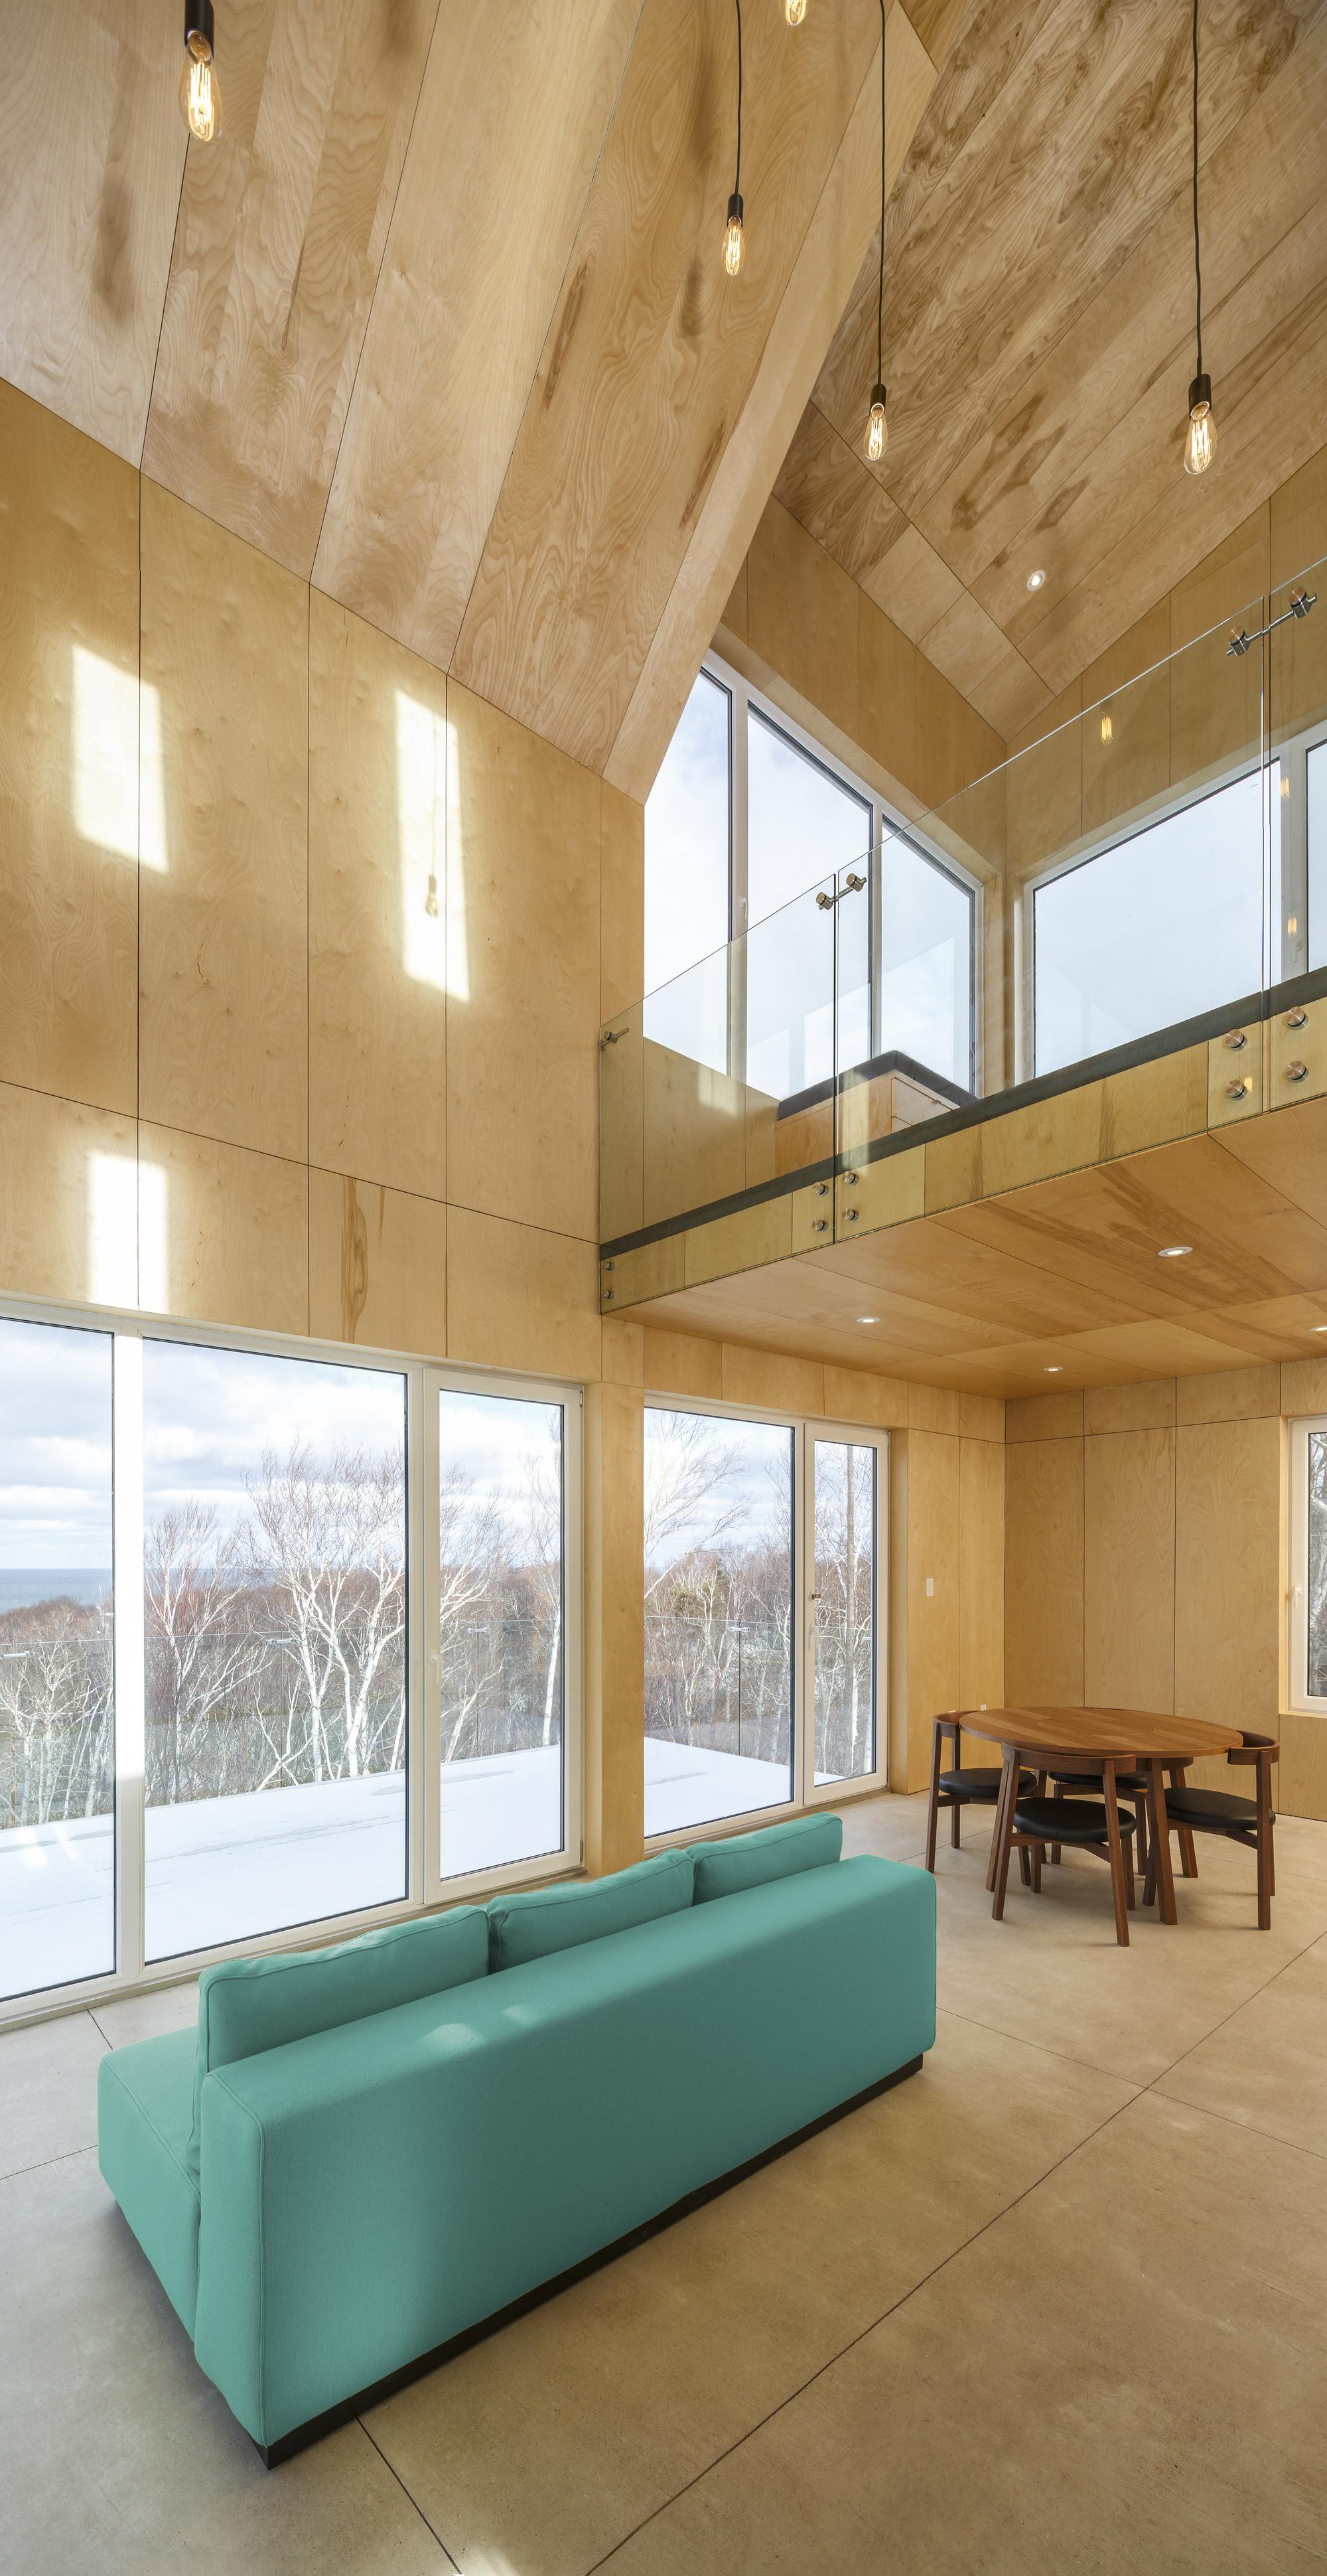 Rabbit Snare Gorge Omar Gandhi Architect Design Base ArchDaily   Home Design  Base